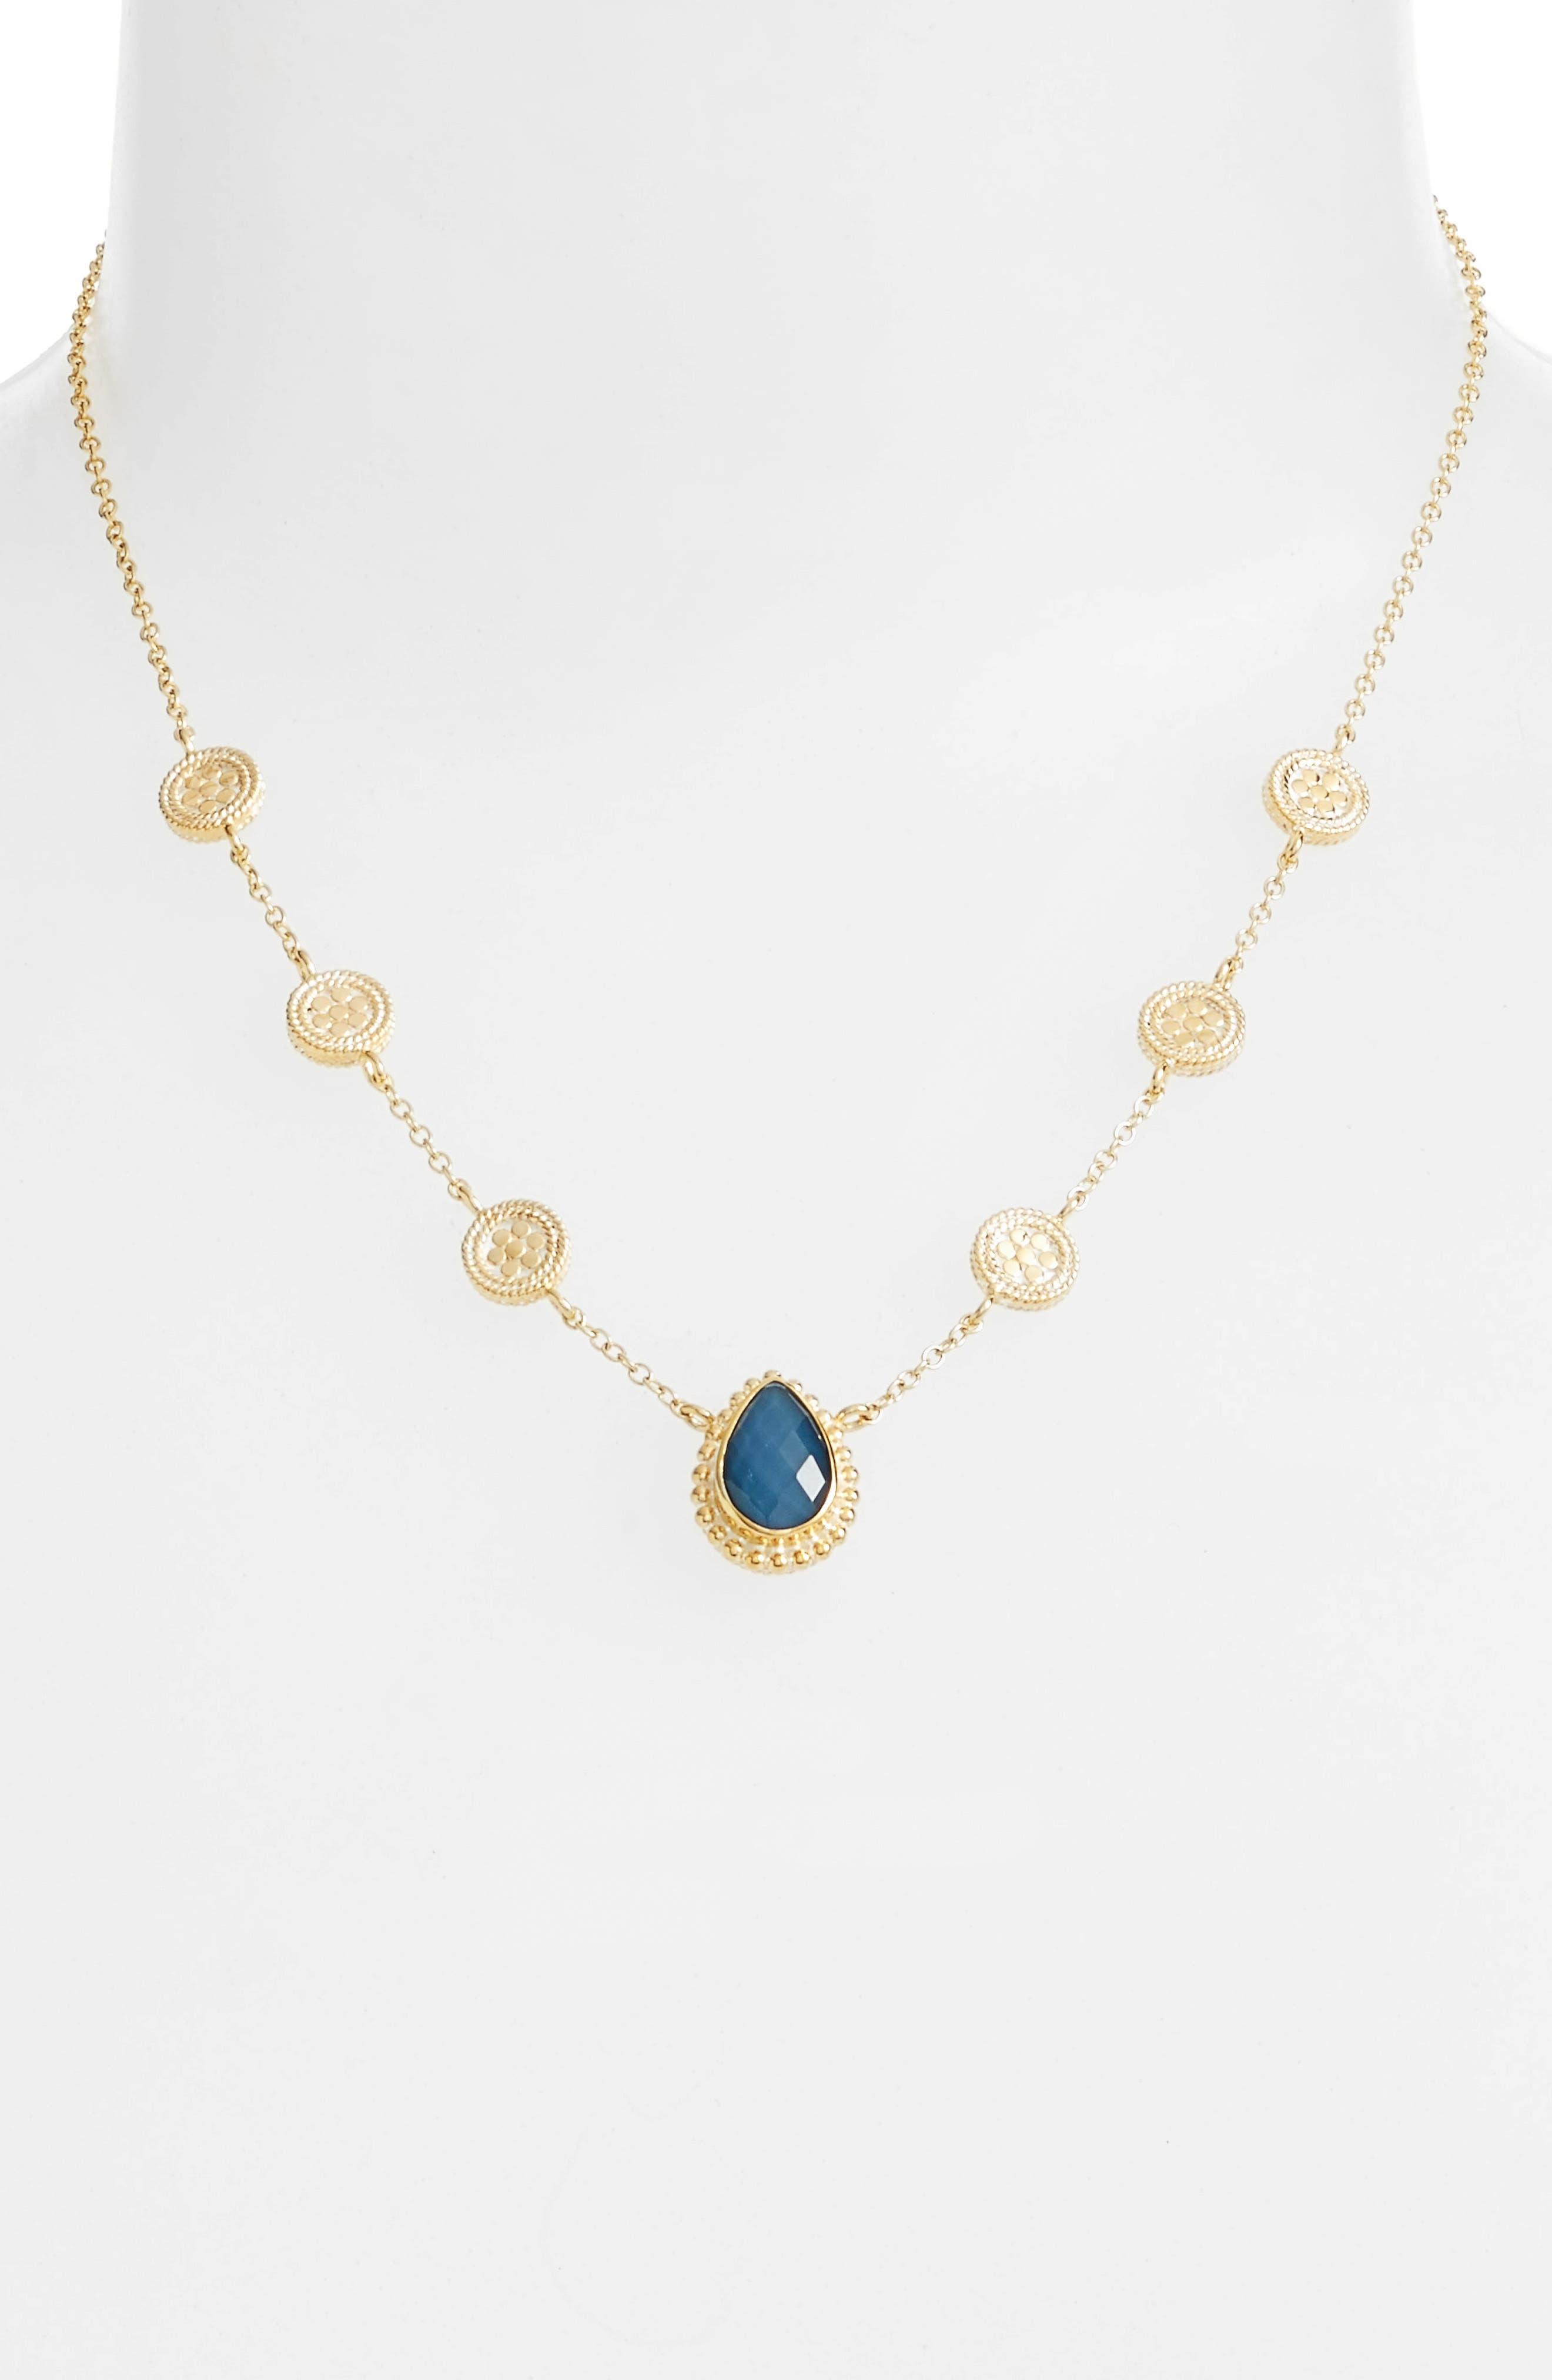 ANNA BECK Blue Quartz Reversible Collar Necklace